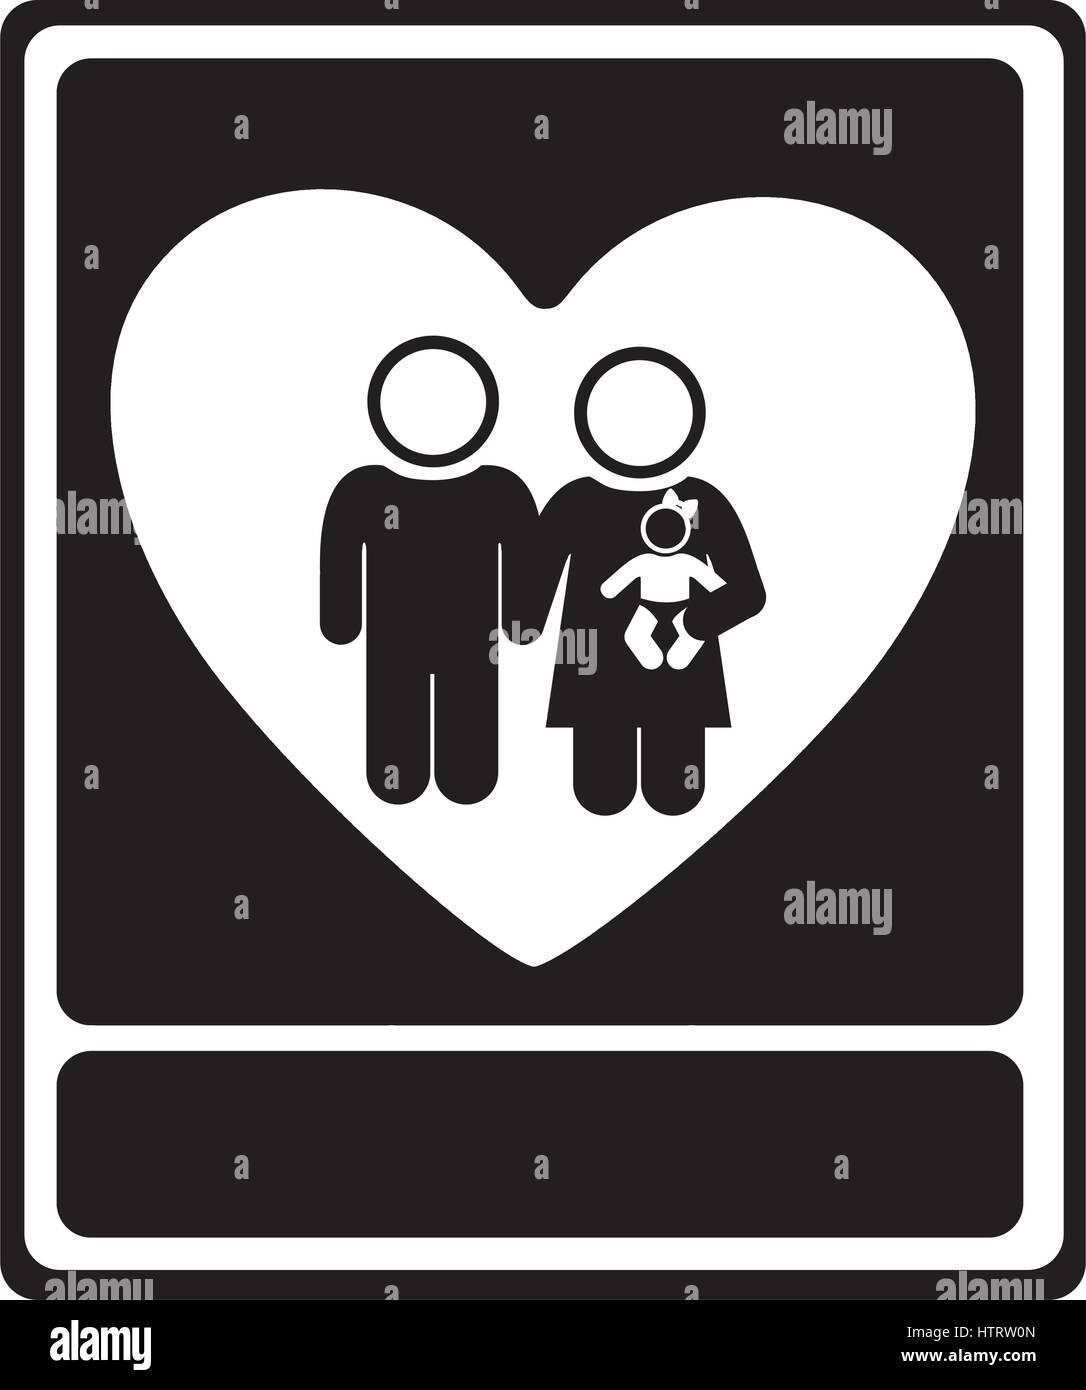 Monochrome Portrait Of Family Unity Stock Vector Art Illustration